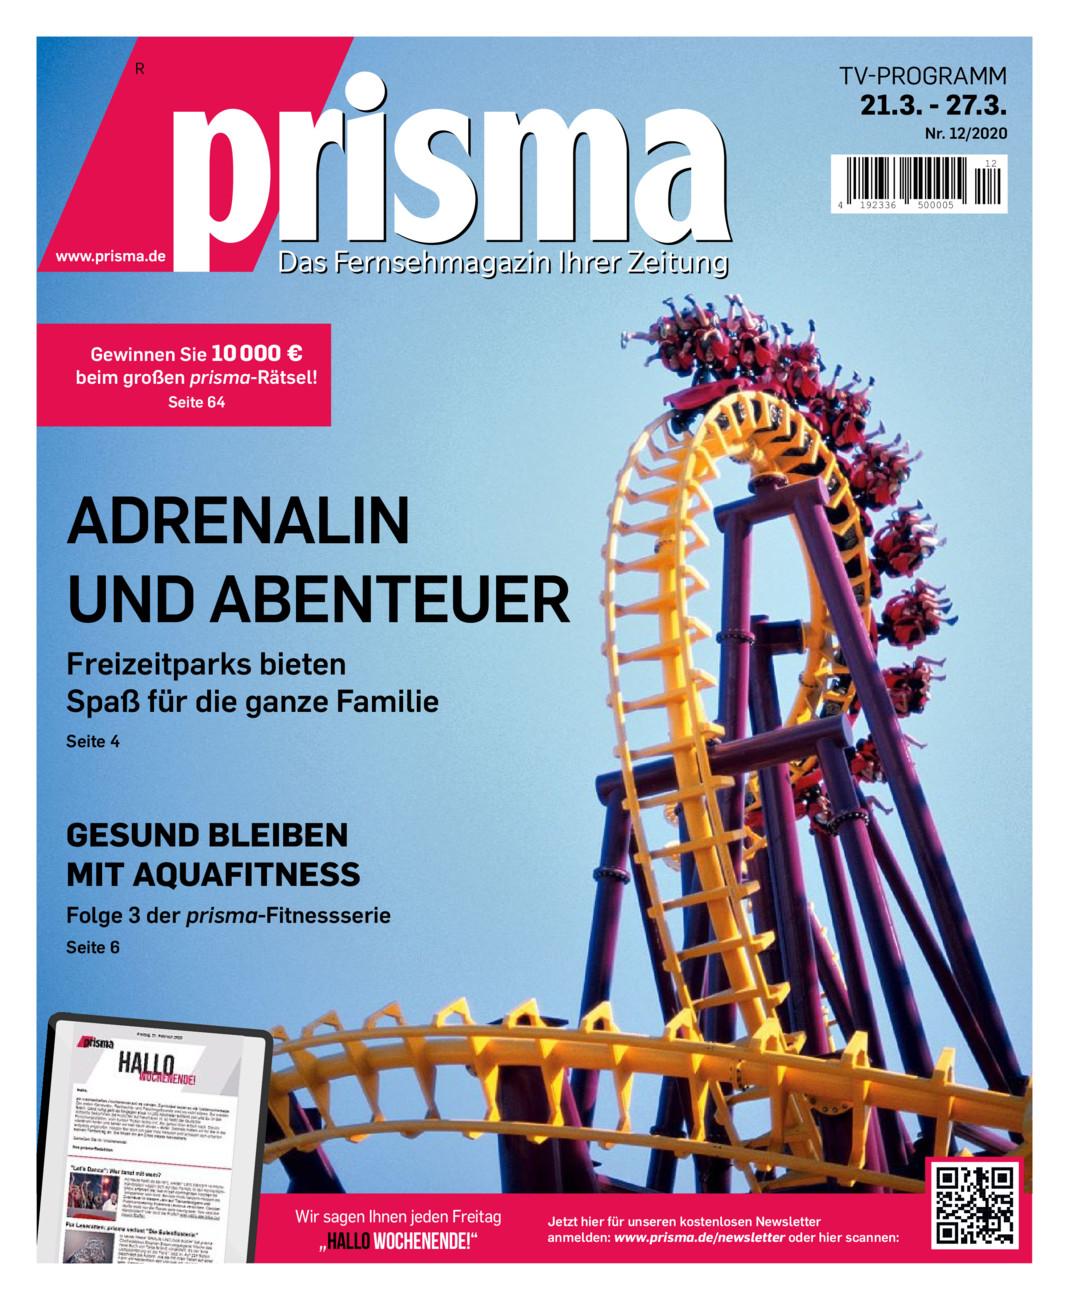 Prisma 21. - 27.3